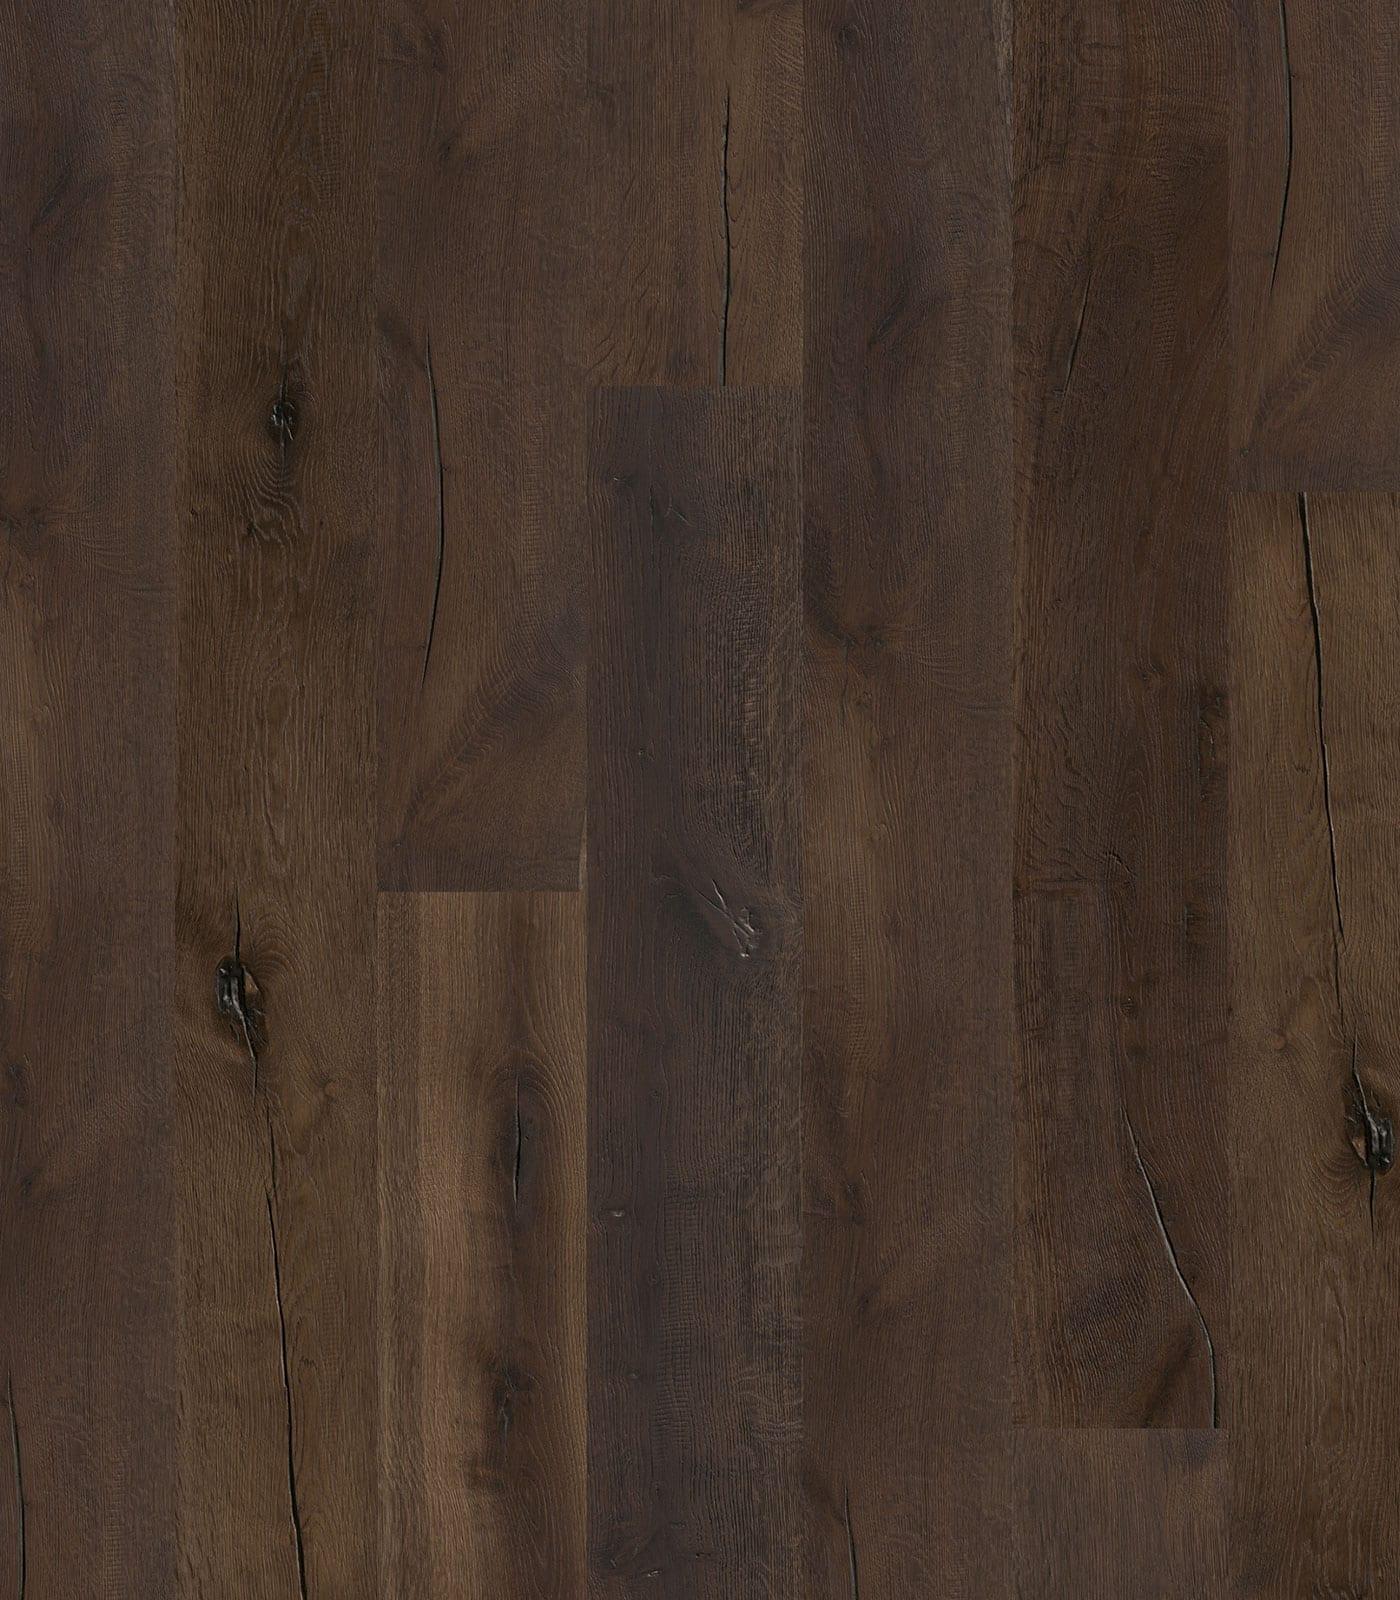 Atlay-Antique Collection-European Oak Floors-flat